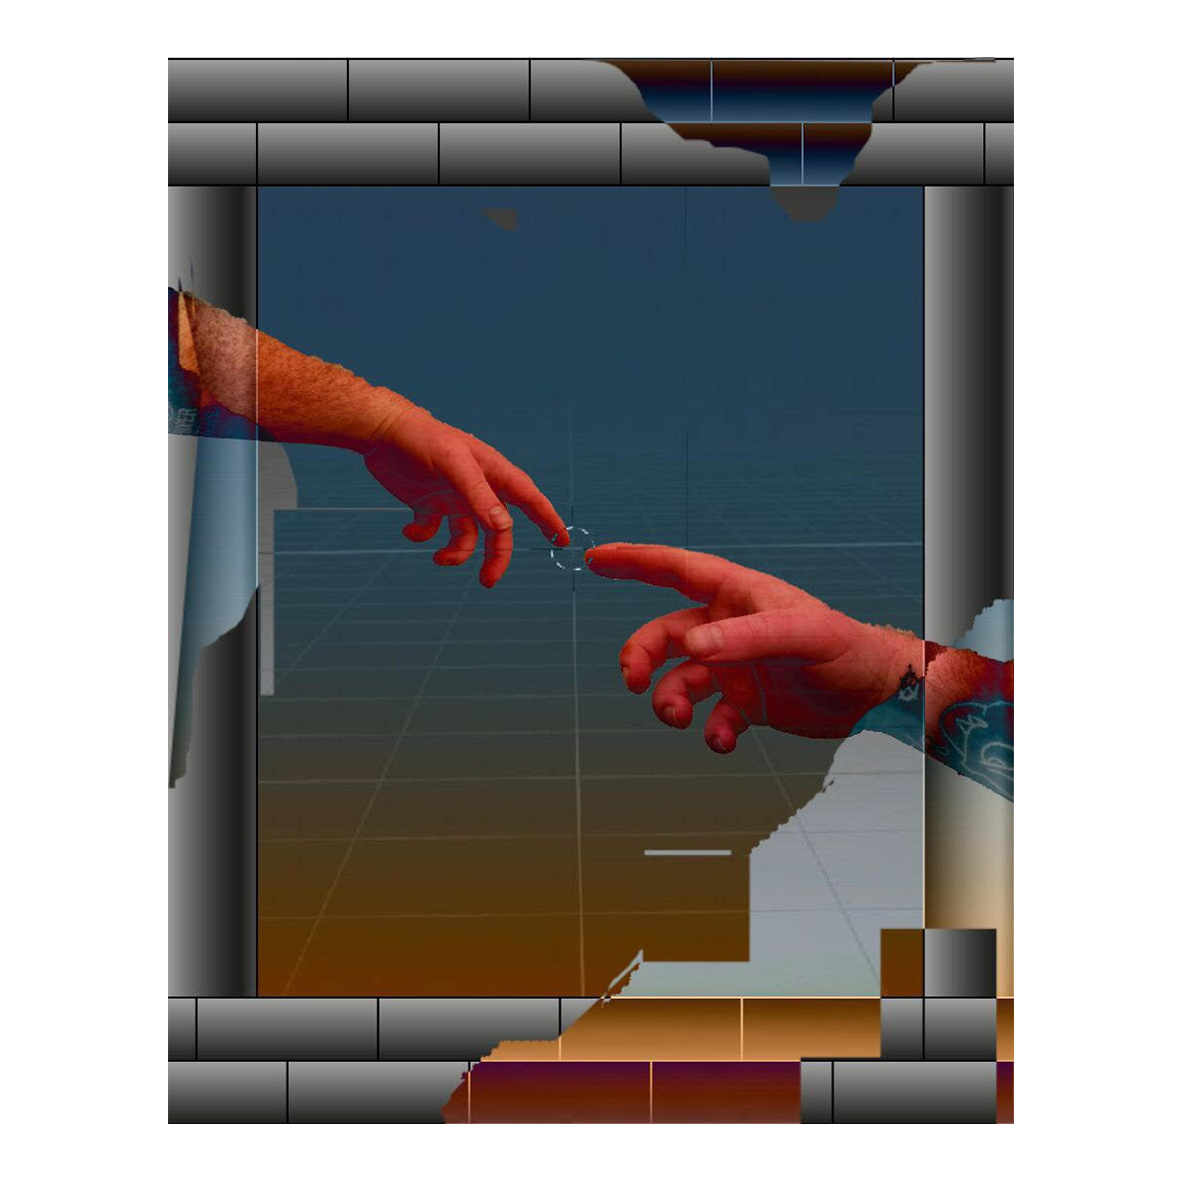 Sean Rennison Phillips Digital Genesis, (2020) Digital image